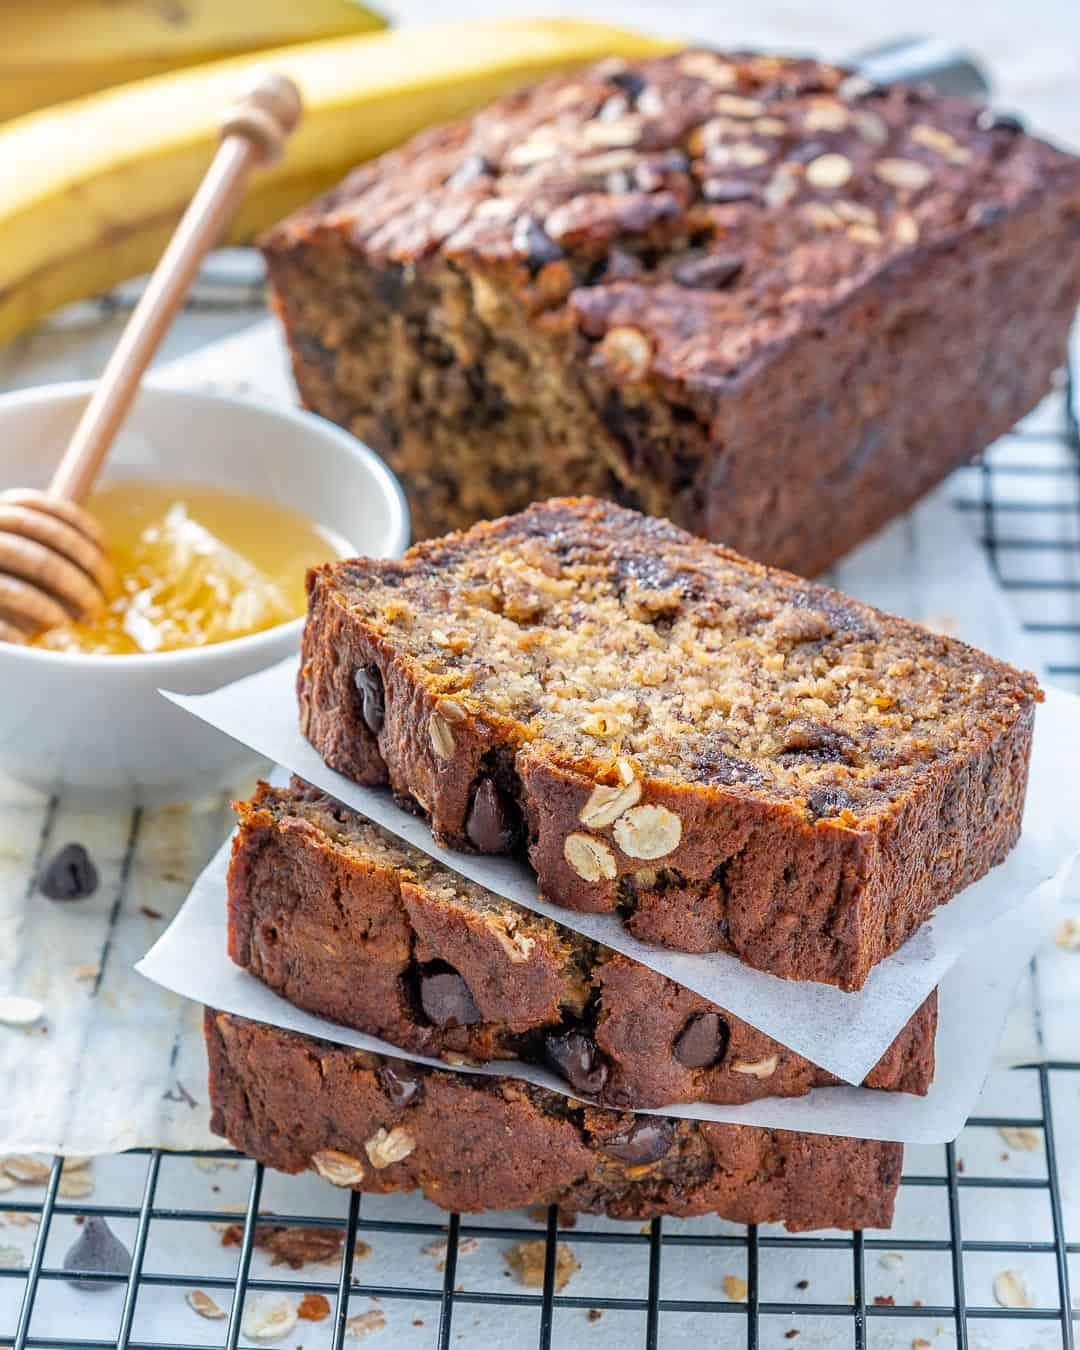 Healthy Oatmeal Chocolate Chip Banana Bread | Banana Bread | Healthy Banana Bread | #bananabread #healthybananabread